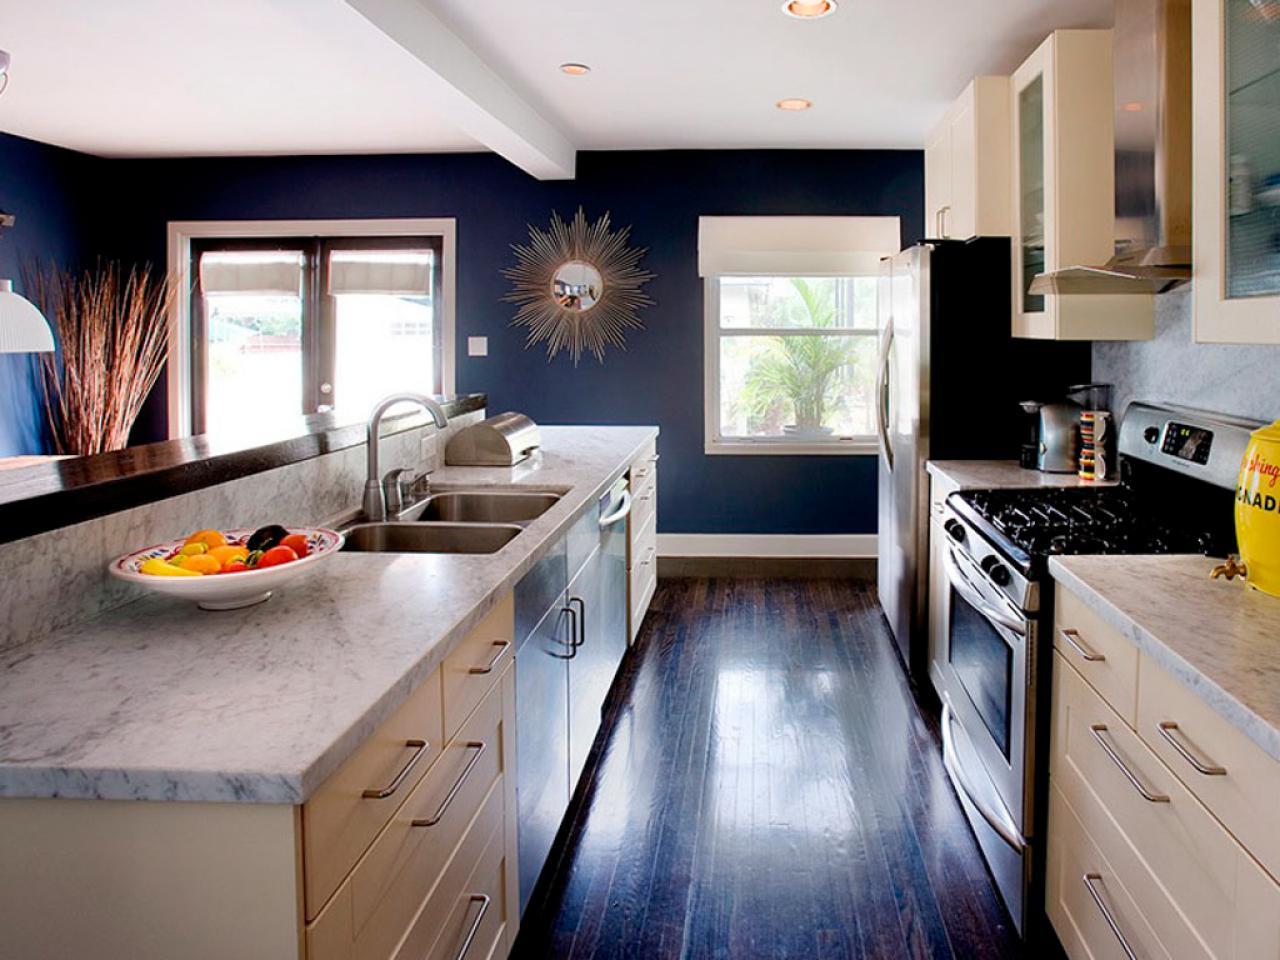 ideer-til-opdatering-køkken-countertops_s4x3-jpg-rend-hgtvcom-1280-960